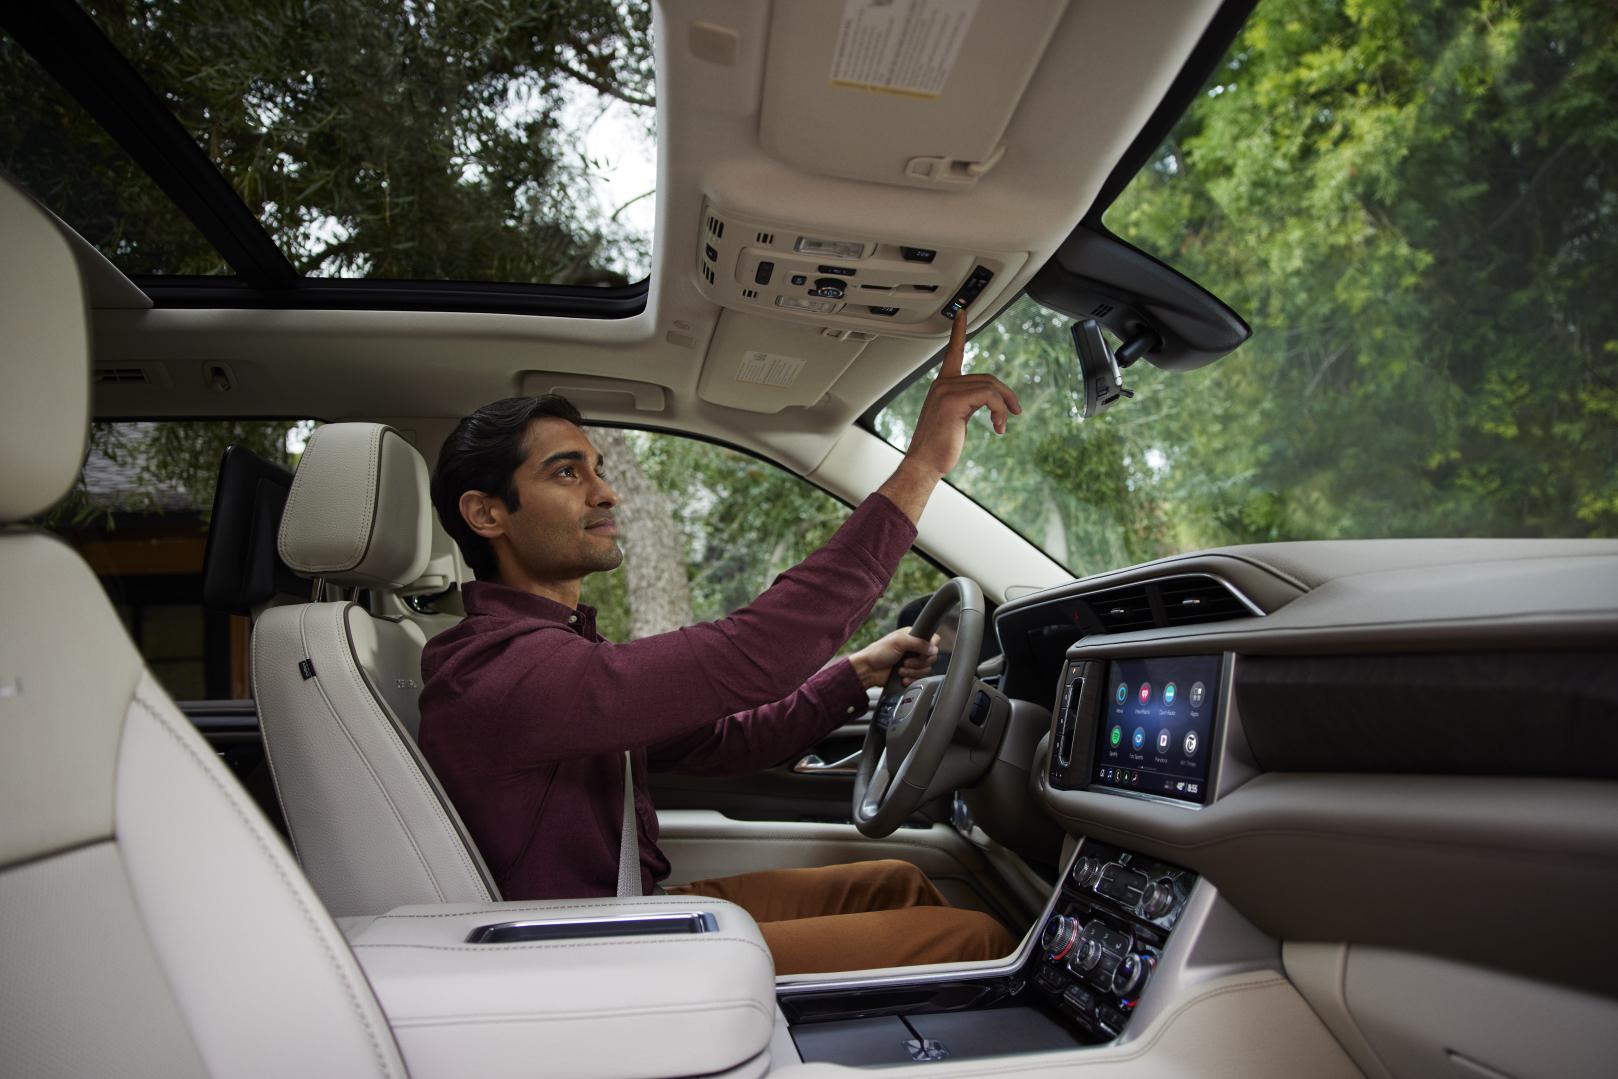 GMC driver using turn-by-turn OnStar navigation